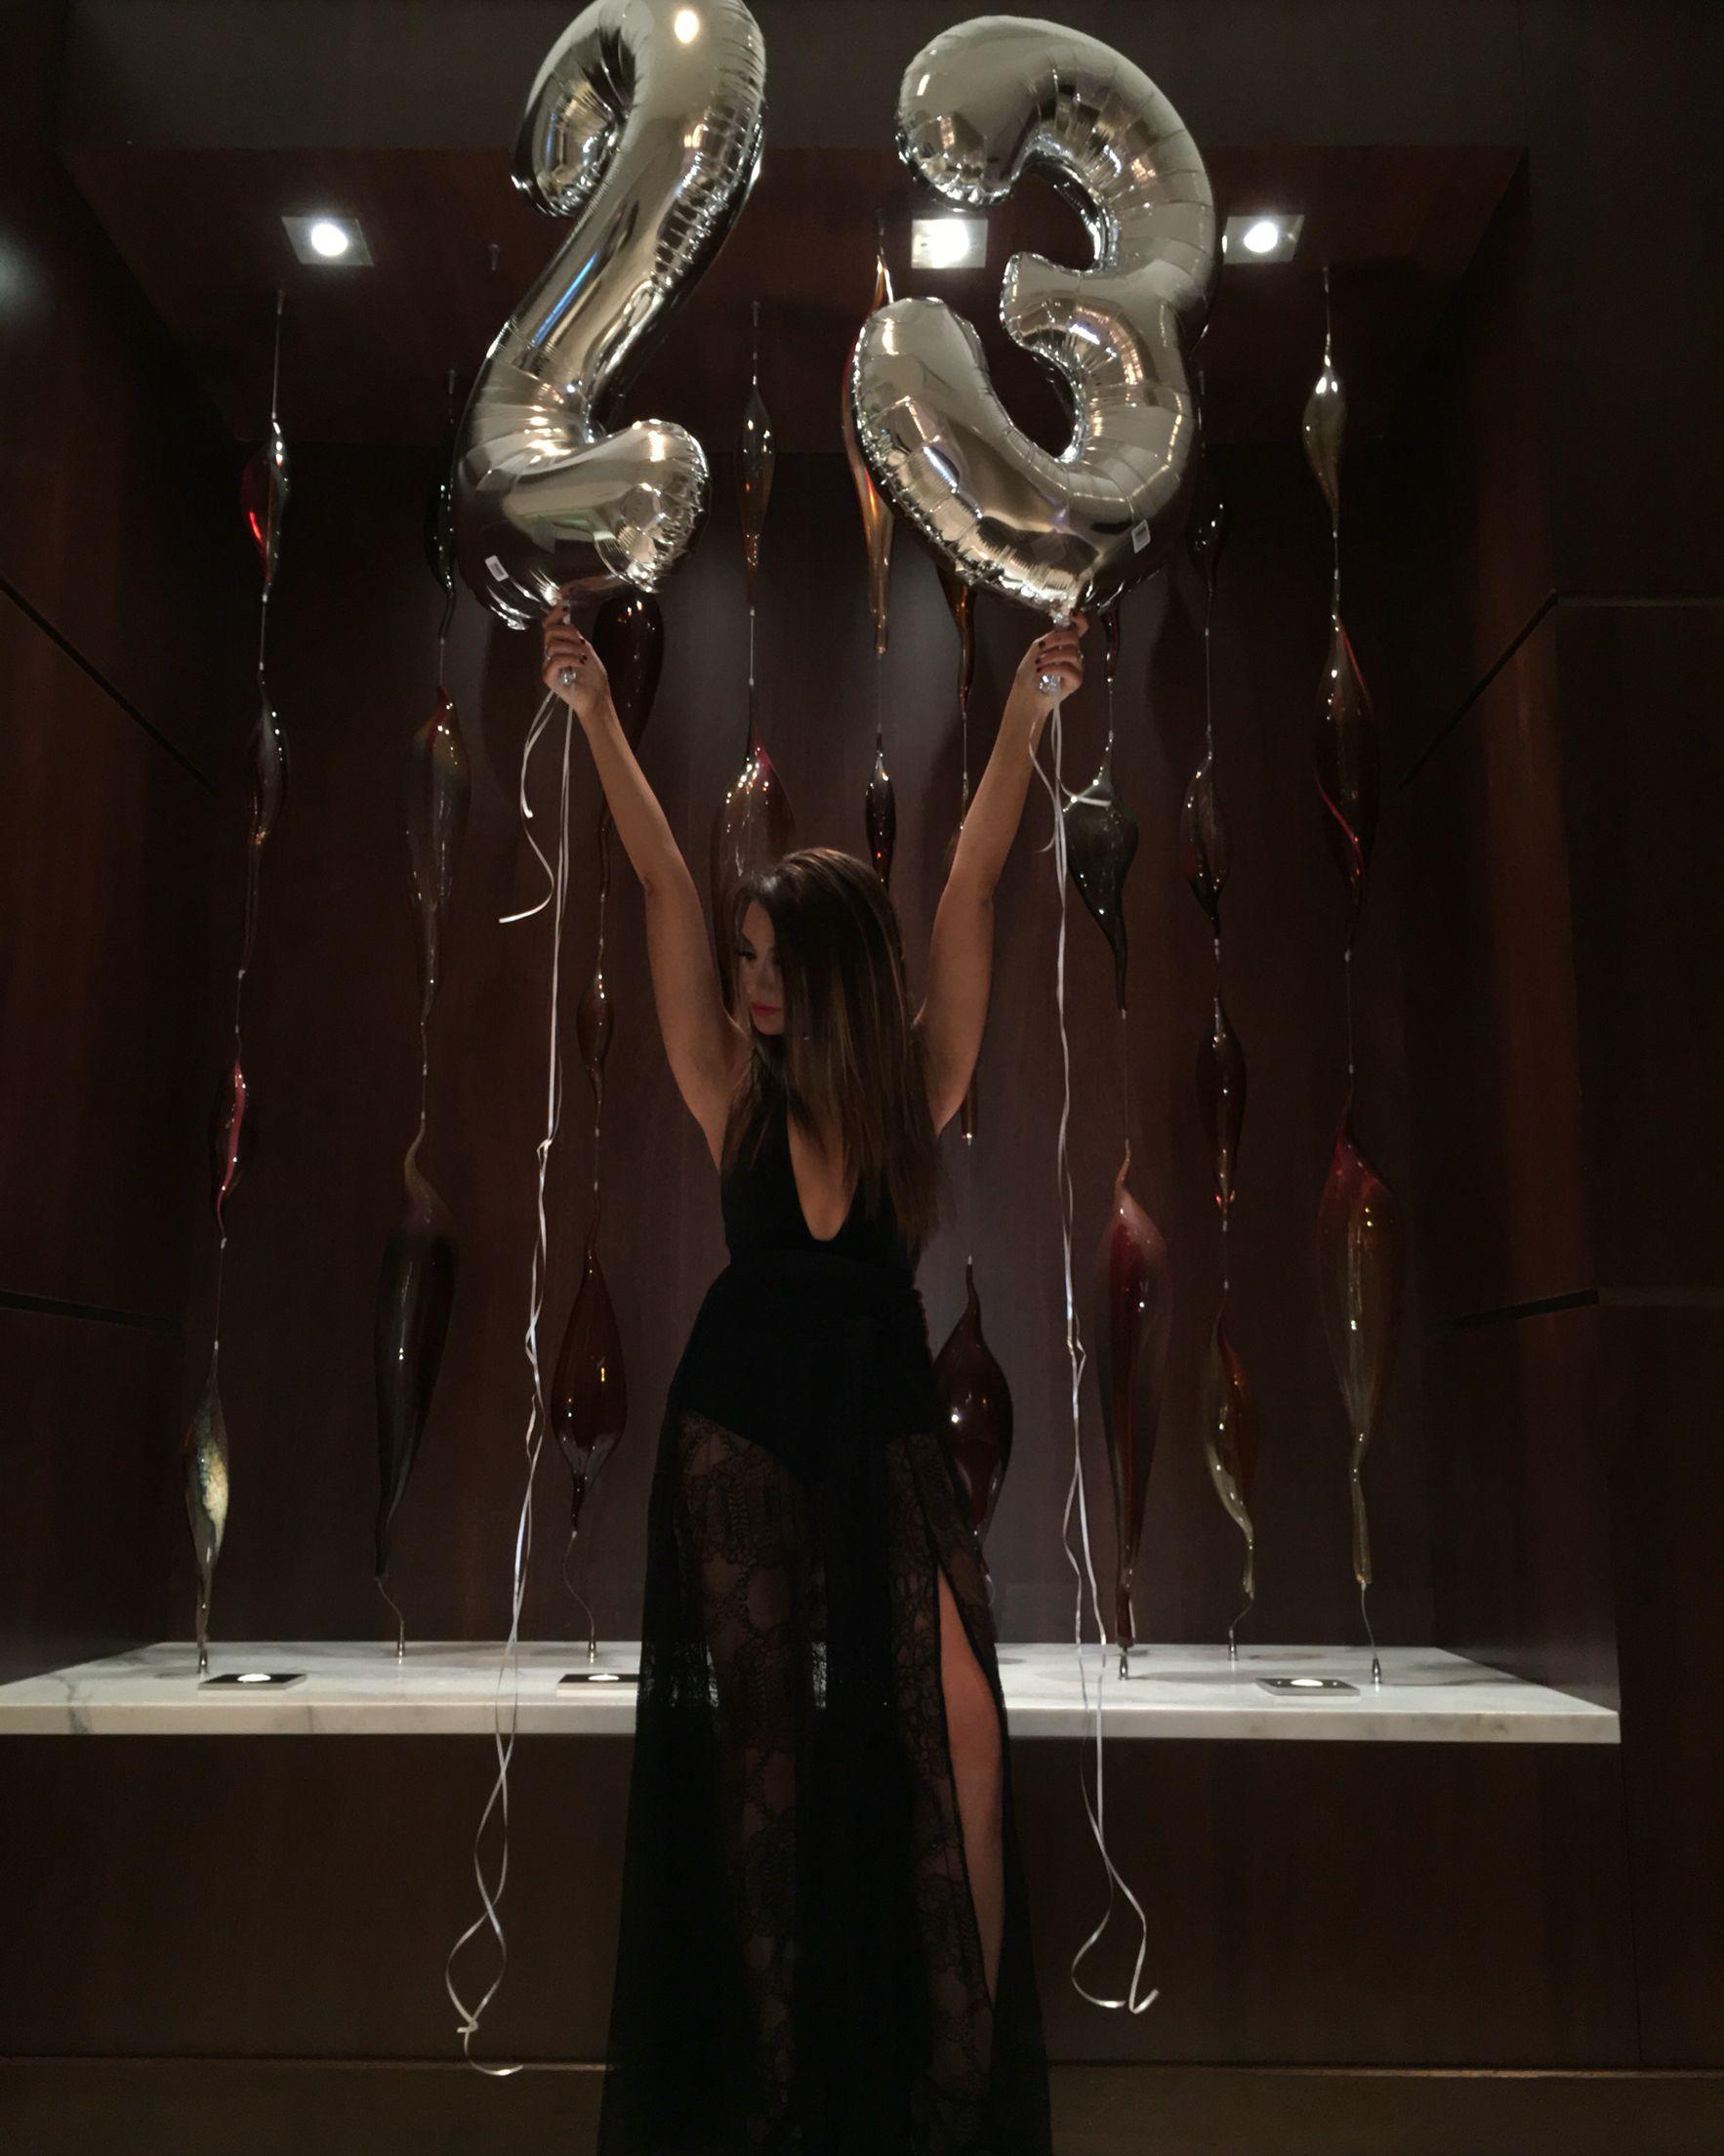 Birthday Picture Balloons Birthday Balloons Number Balloons Beautifoles Birthday Photoshoot 21st Birthday Photoshoot Birthday Ideas For Her